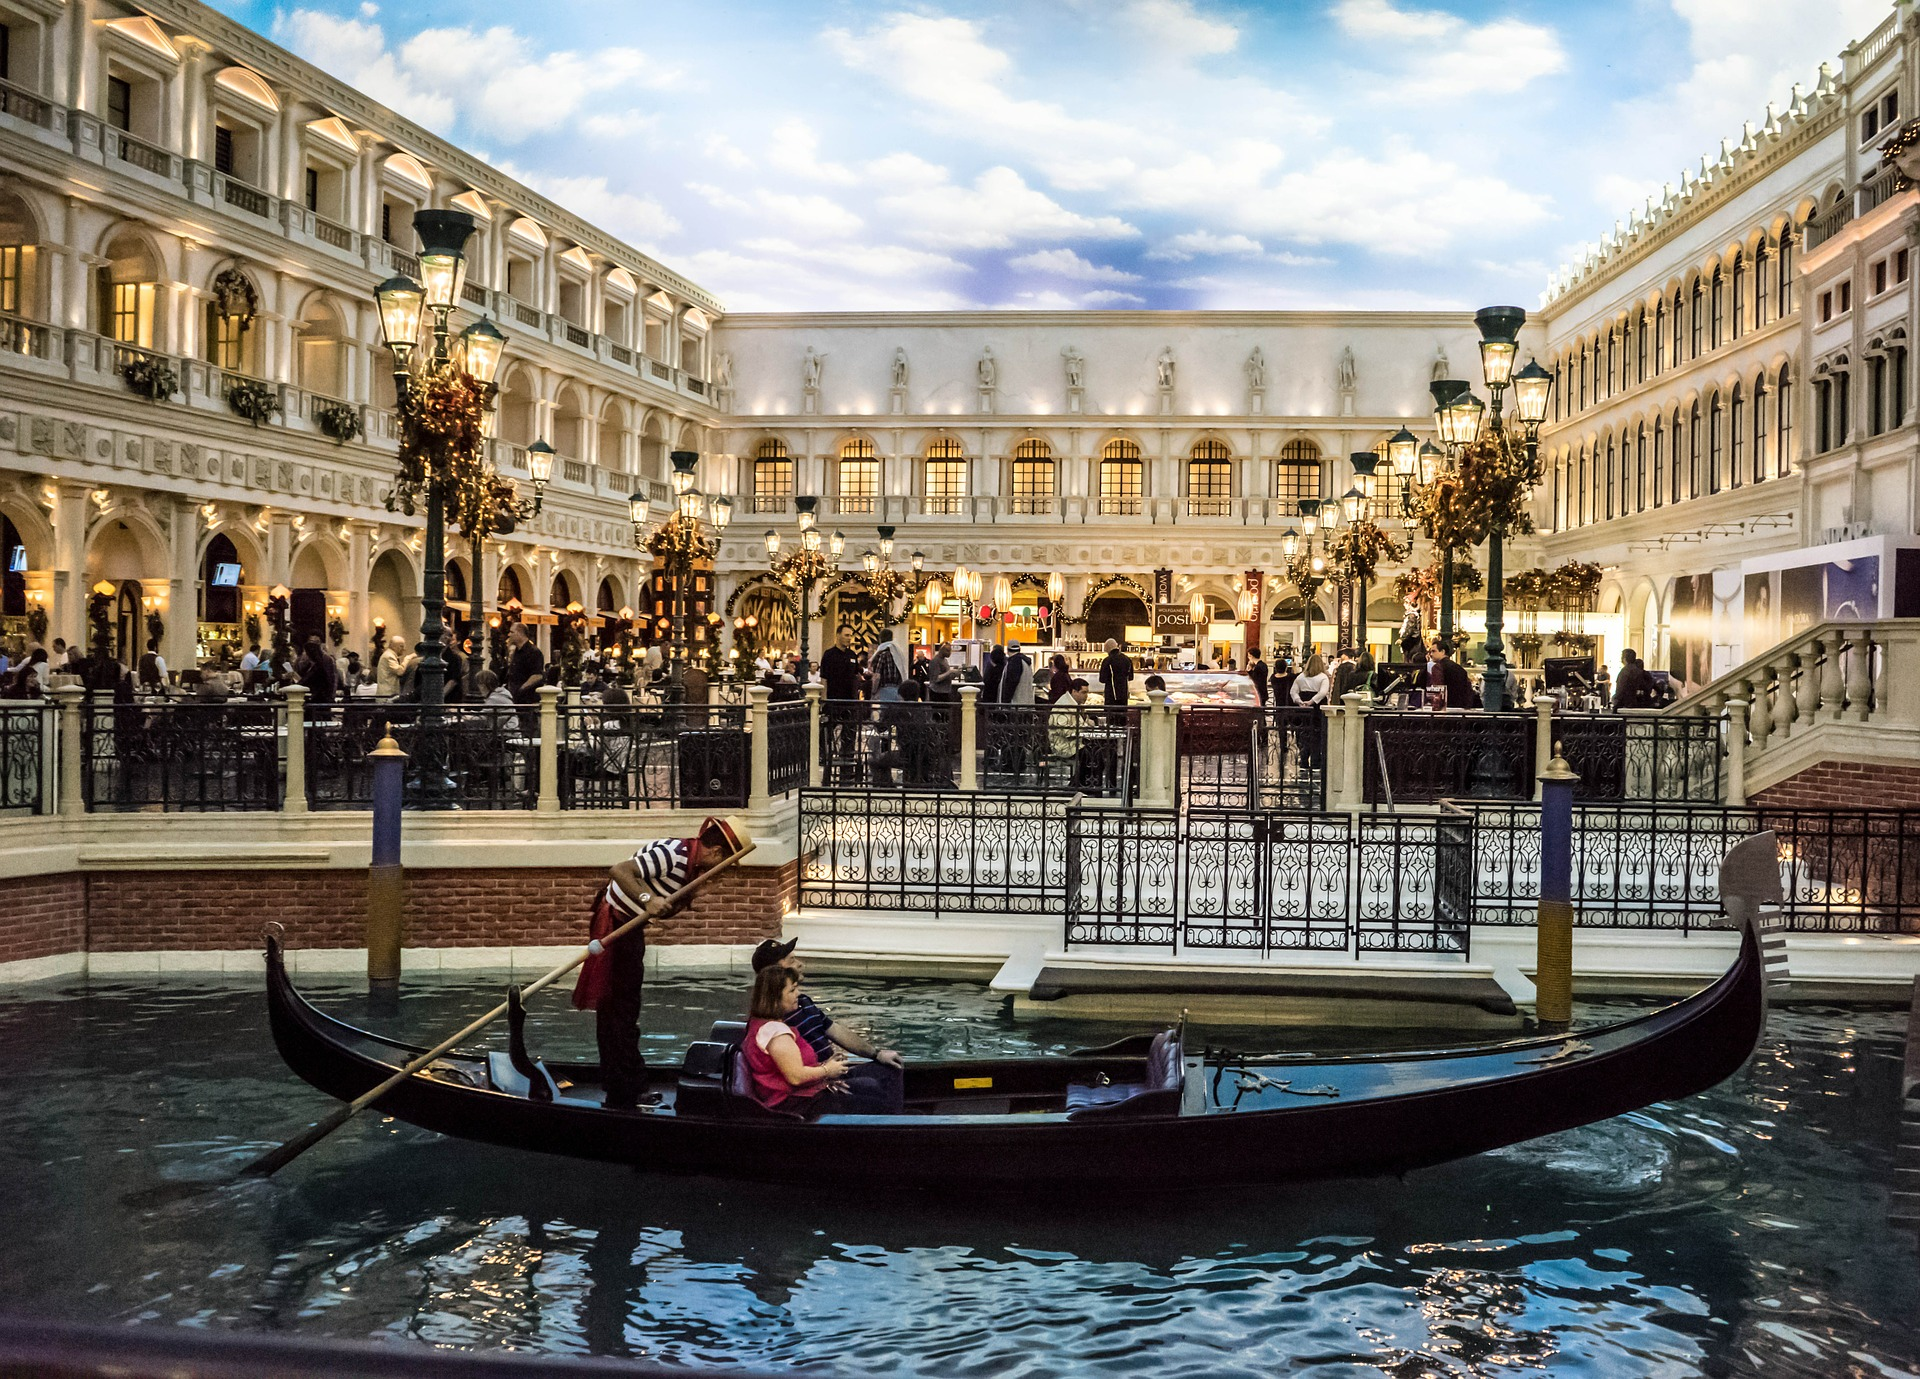 Gondola Ride at The Venetian, Las Vegas, USA